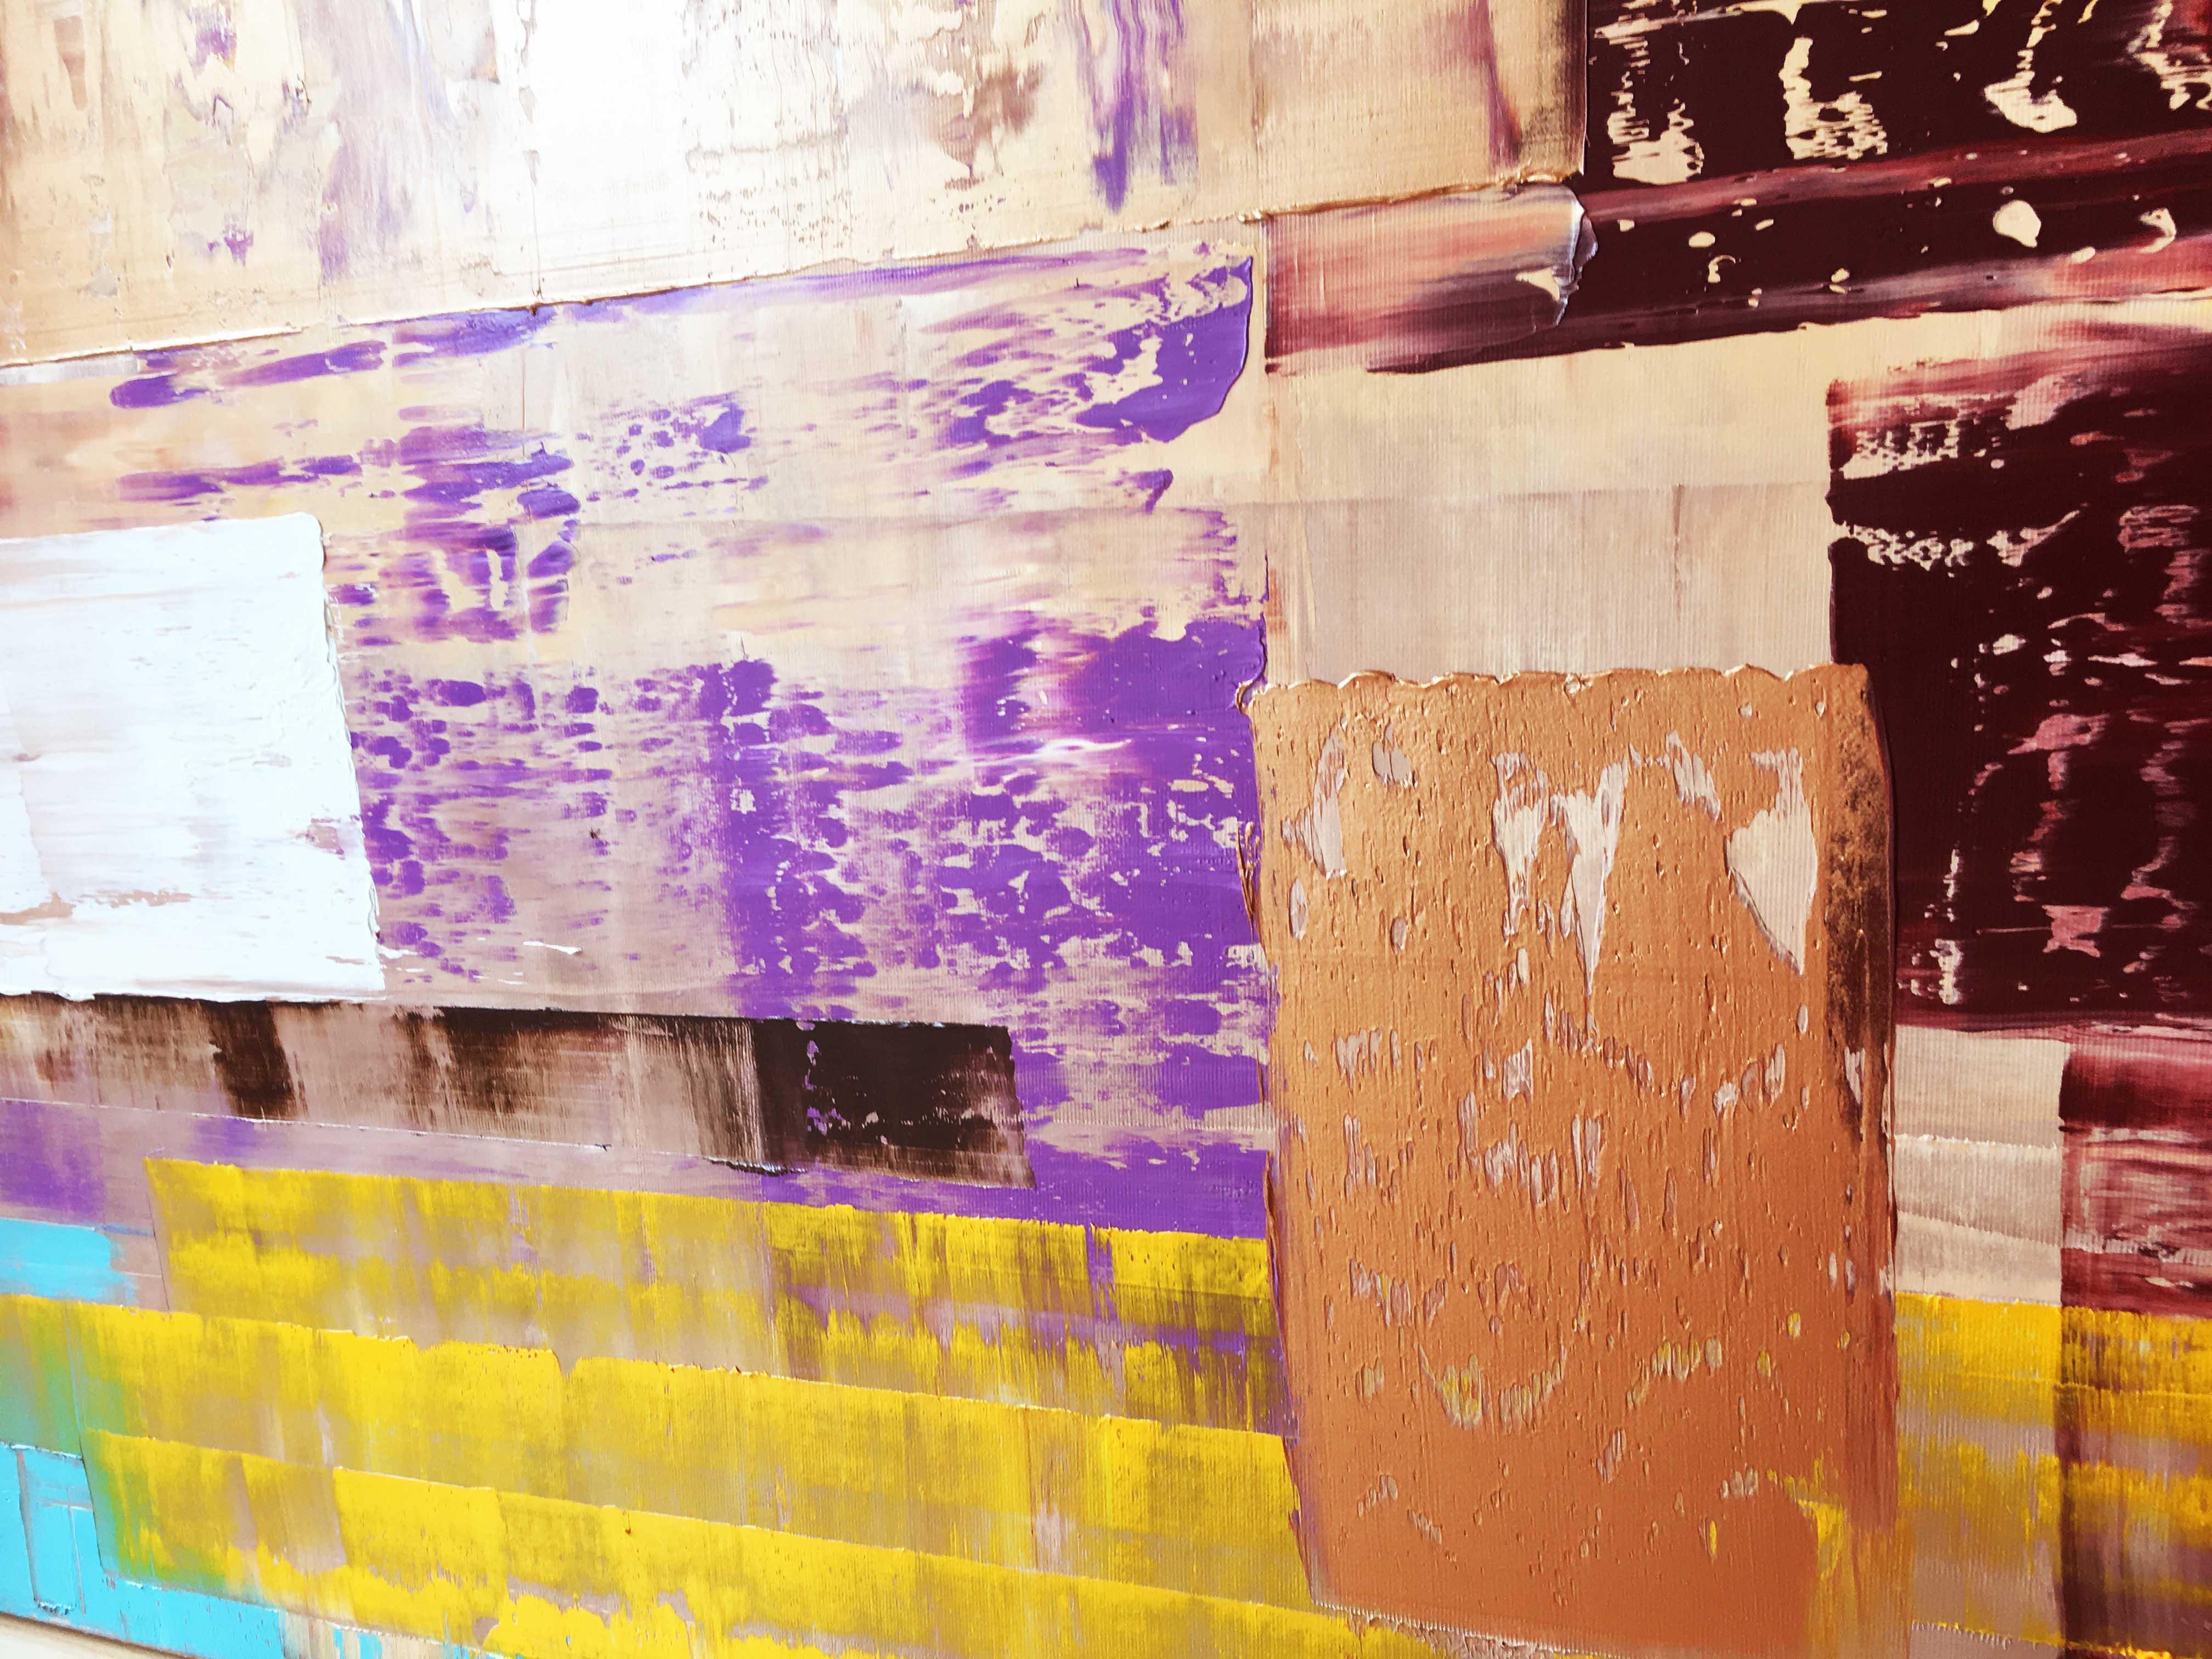 Abstraktní obrazy - Adellyn Art